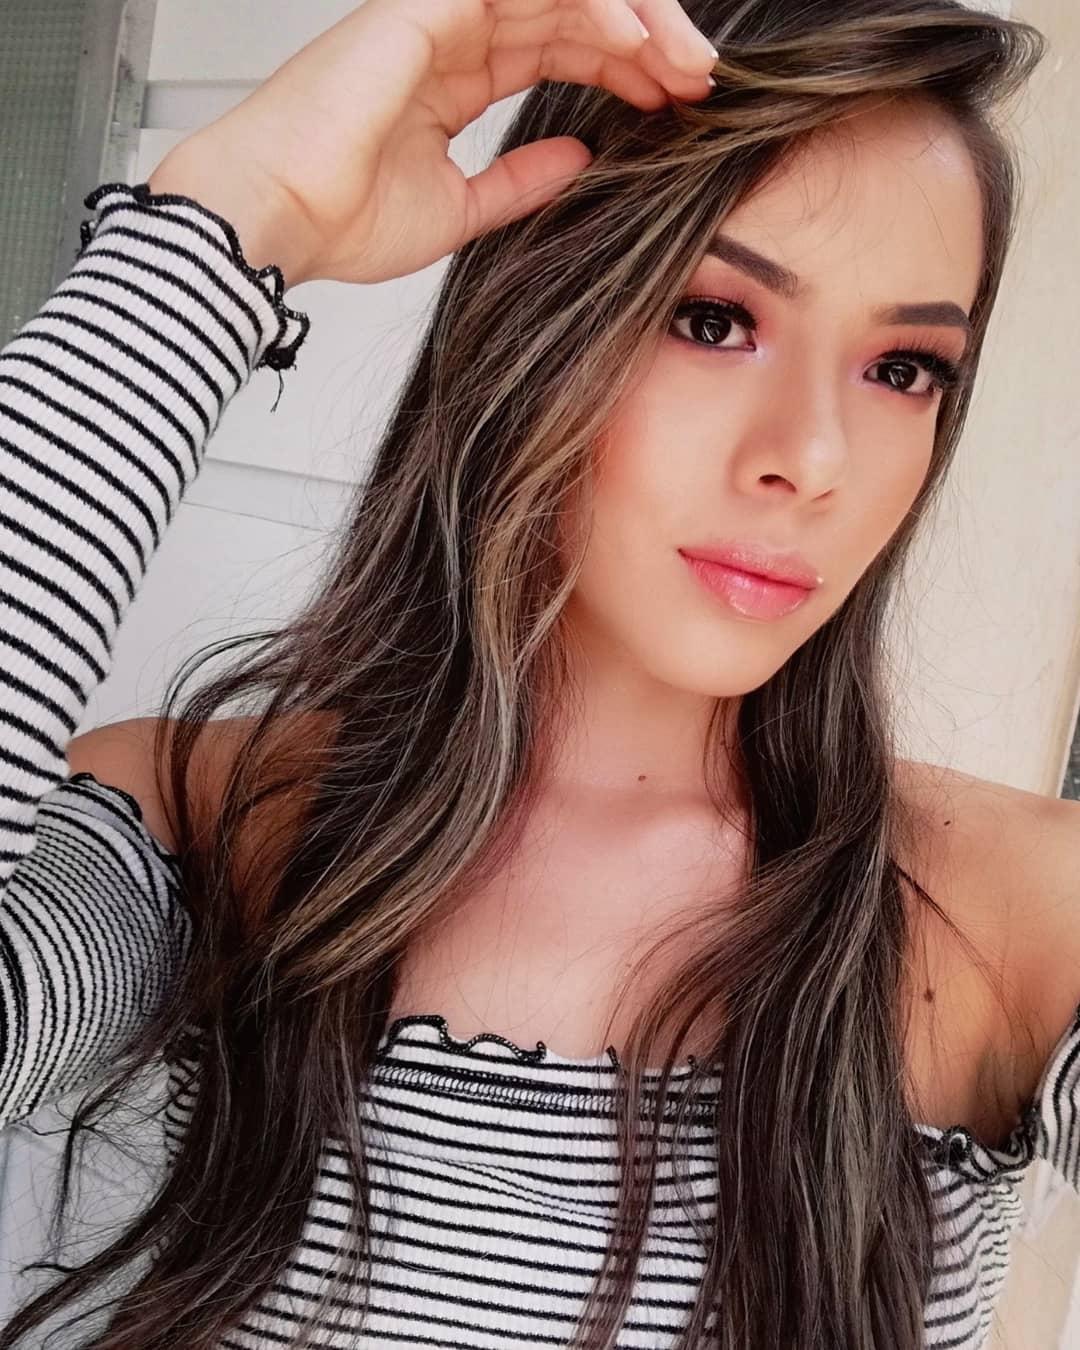 gina aguirre, virreyna de miss latinoamerica 2019. 60990110